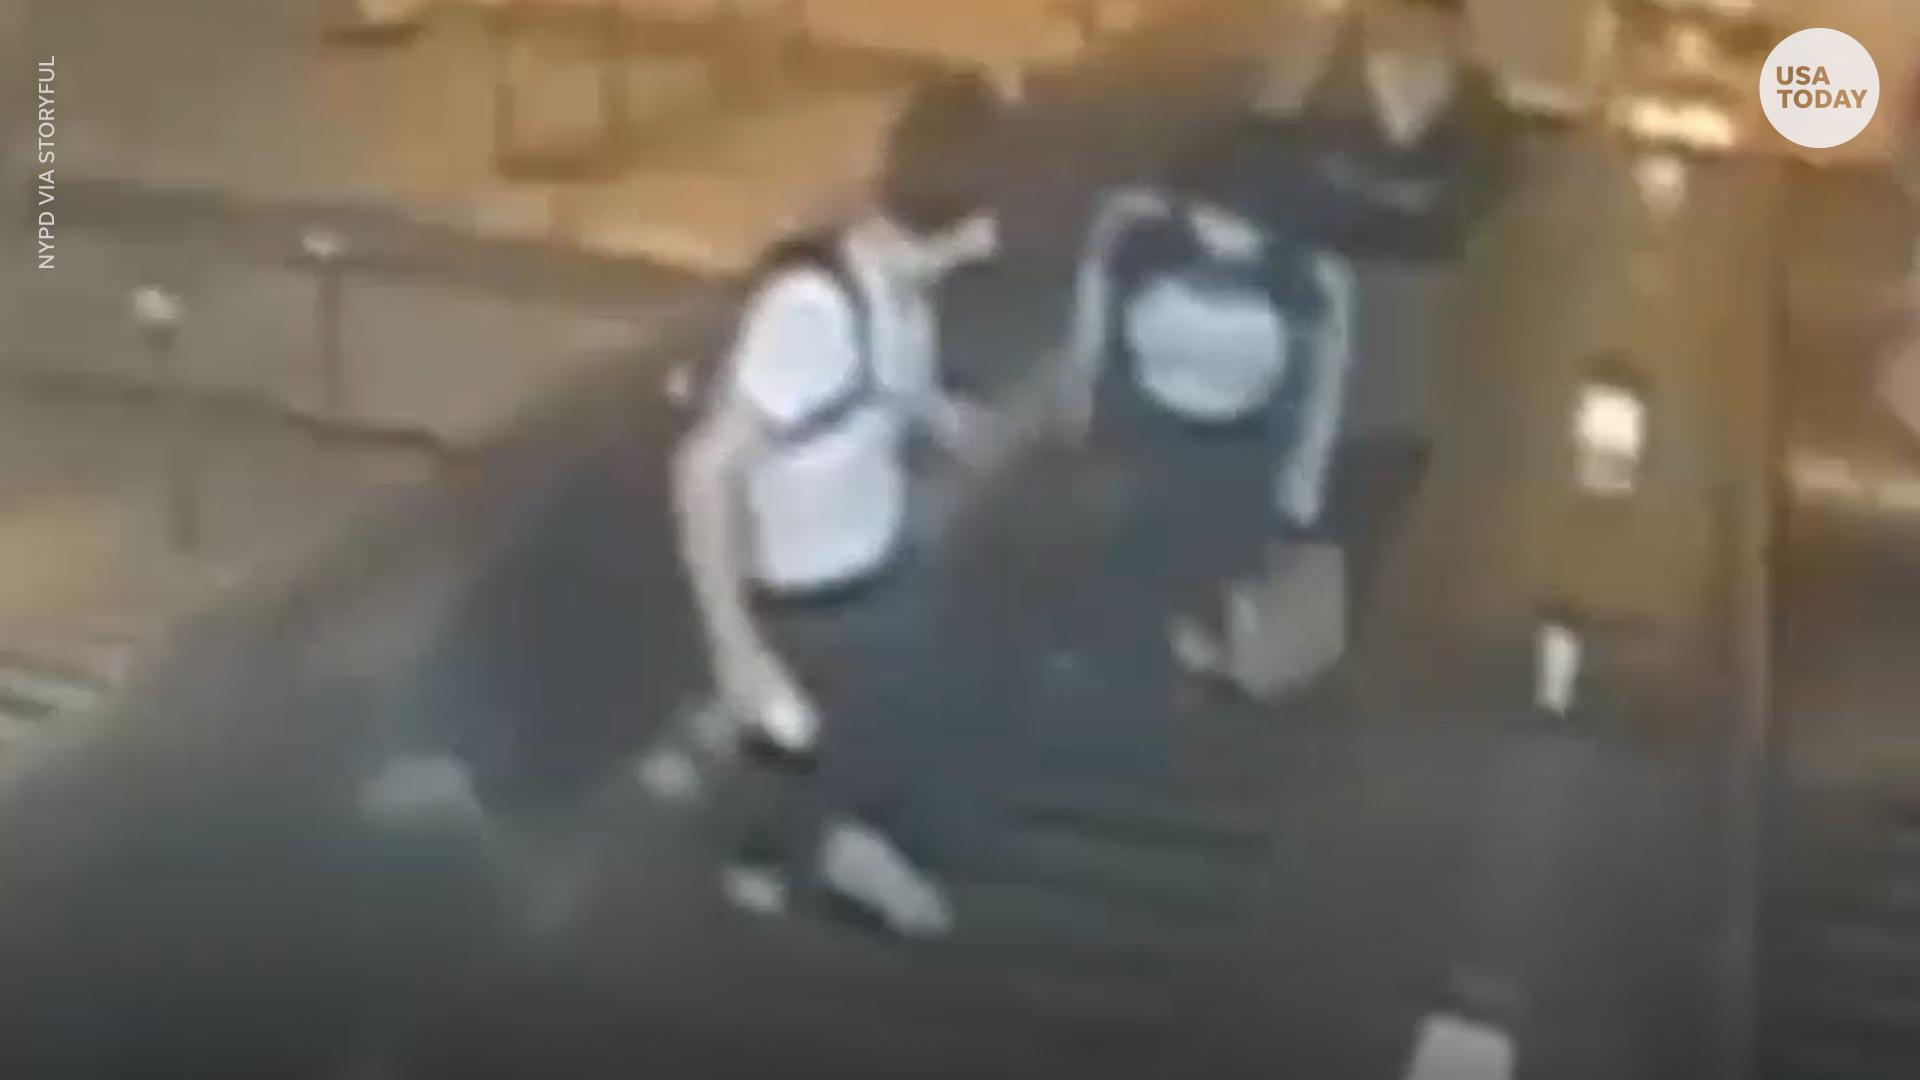 Surveillance video shows man kicking woman on escalator in NYC subway attack